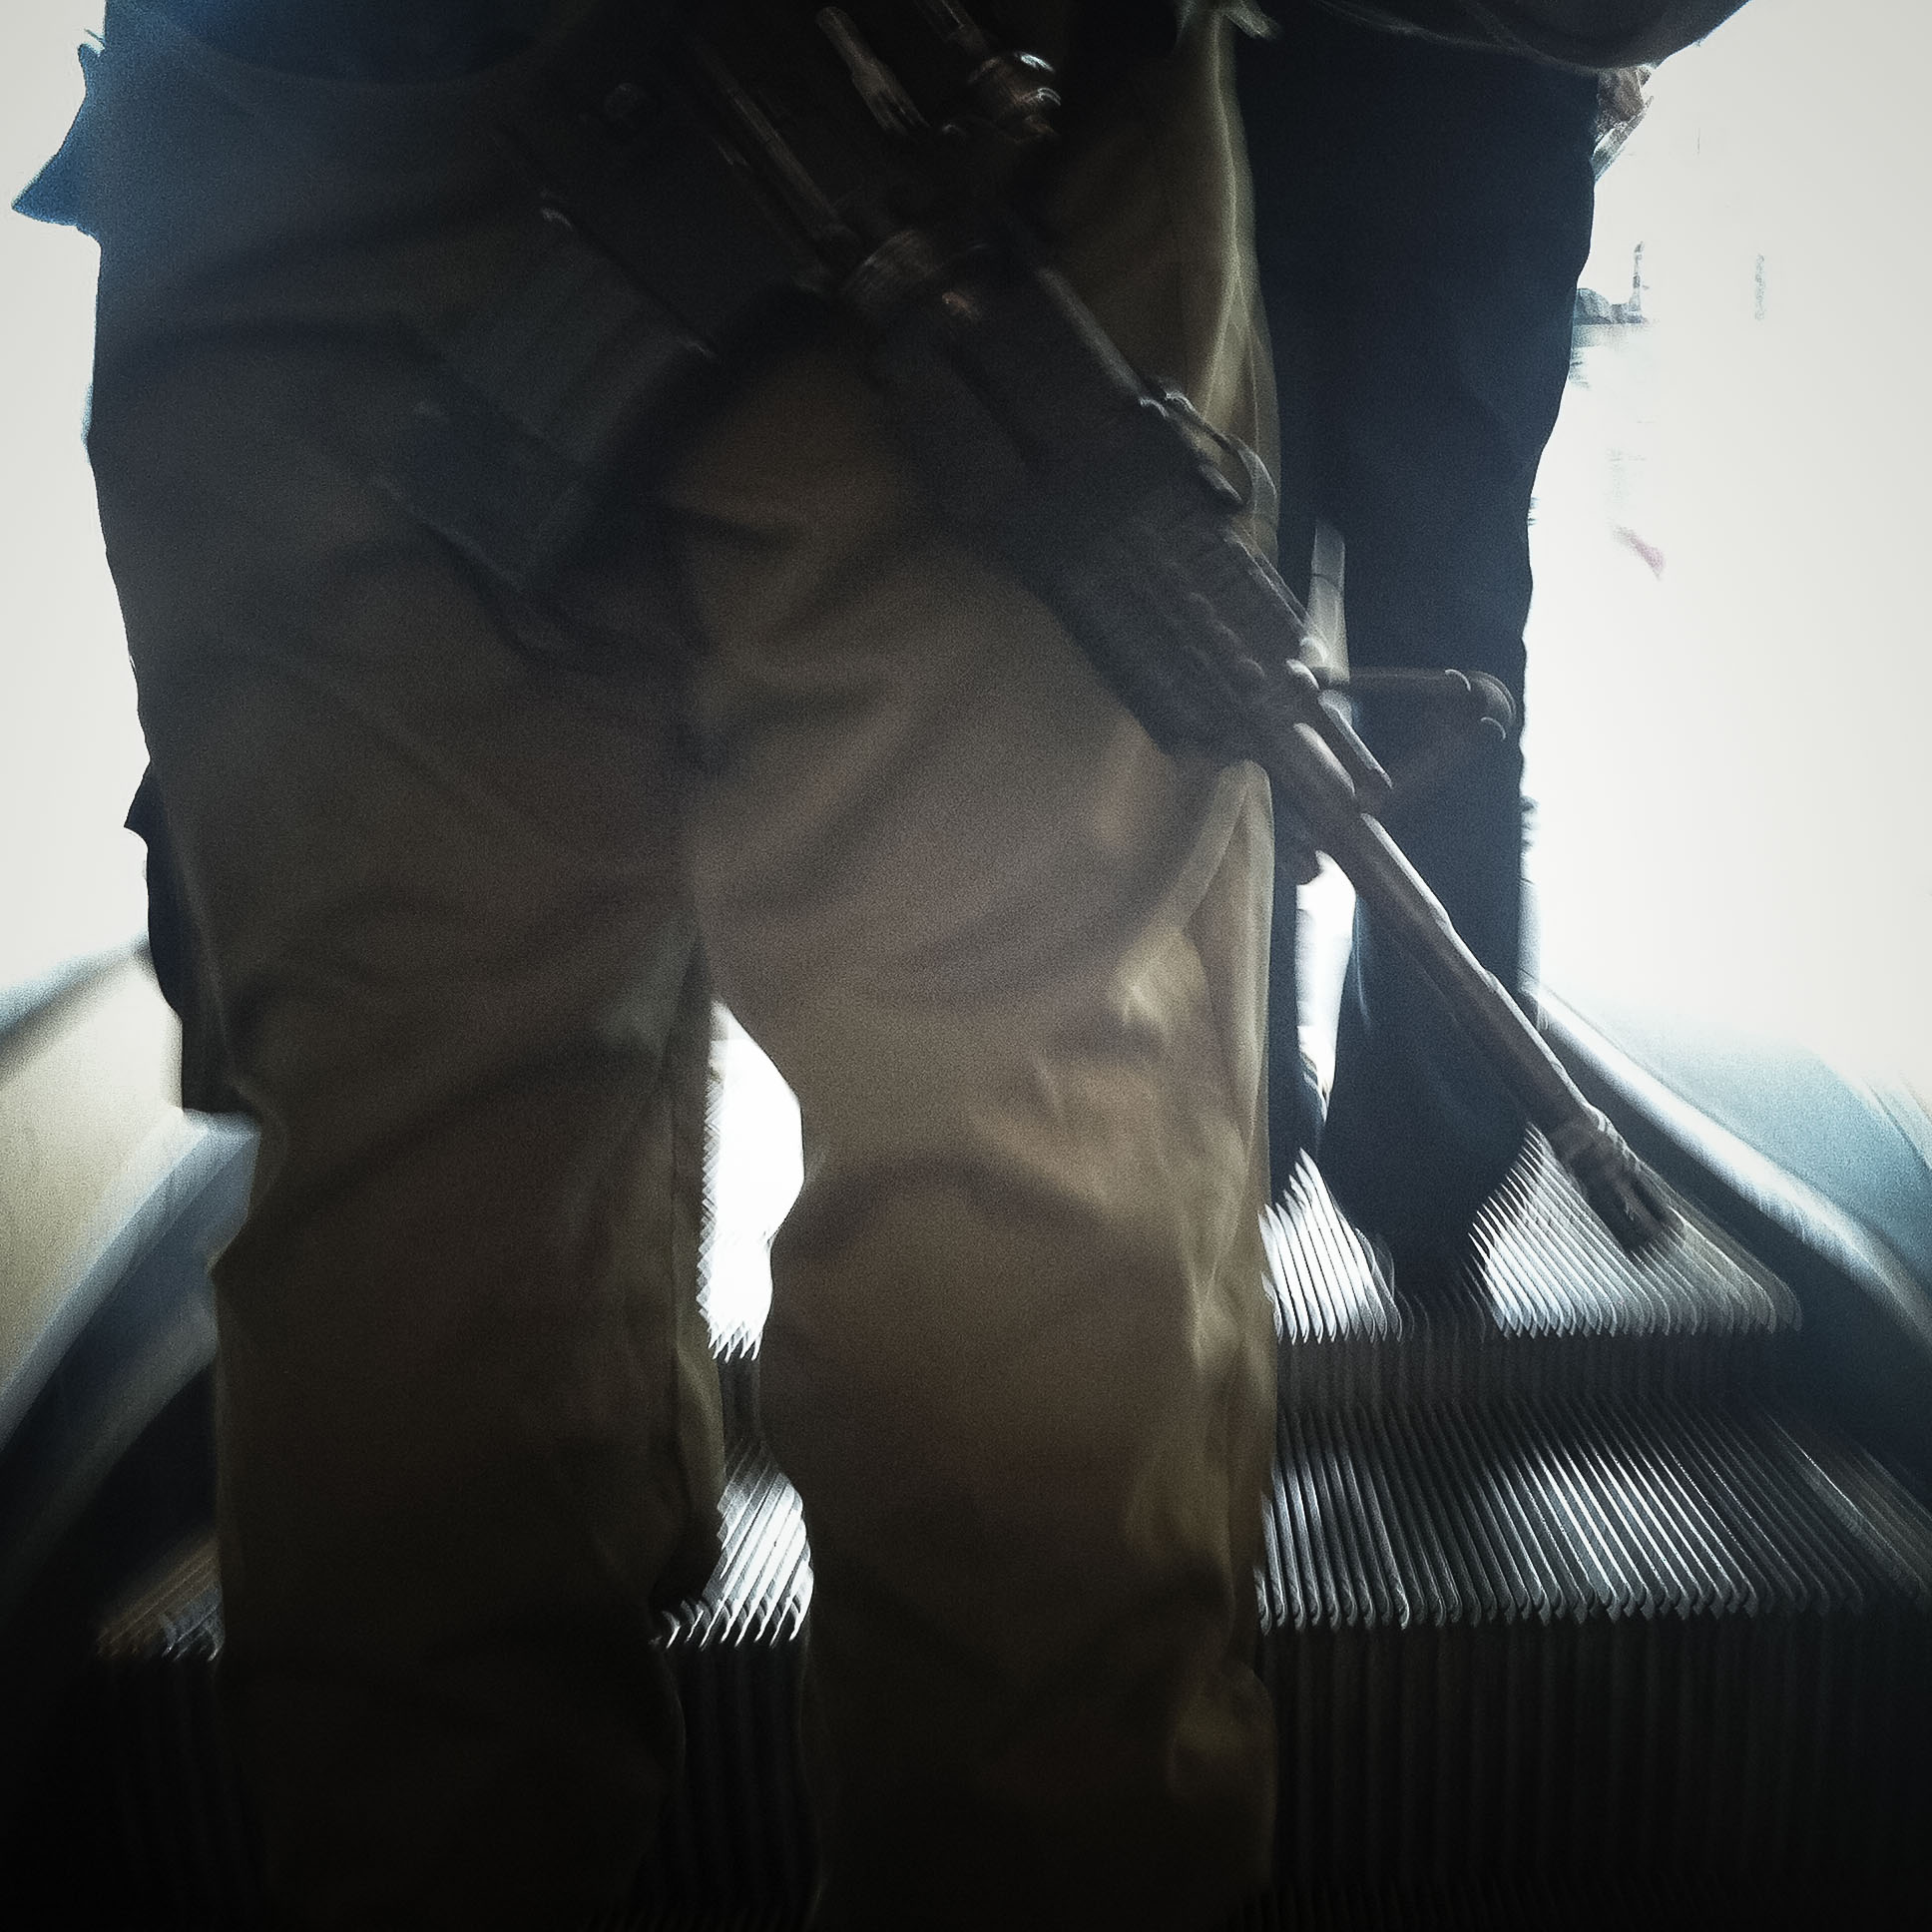 israel-palestina-jordan-6.jpg